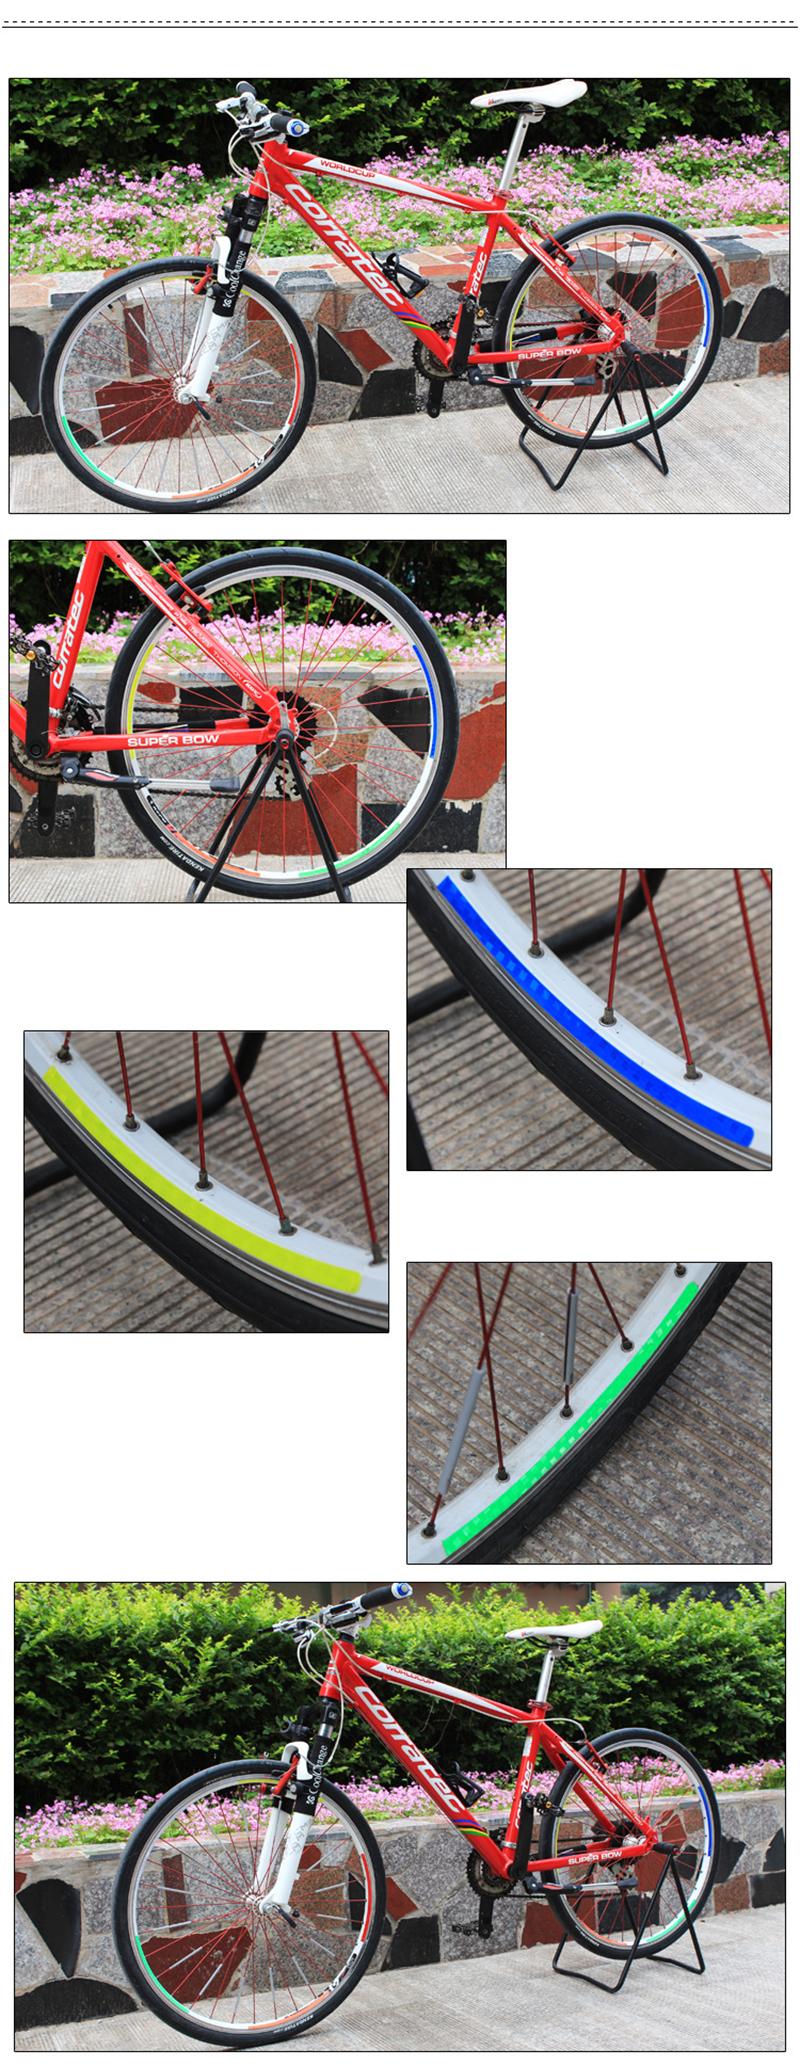 Utility Bike Bicycle Wheel Tyre Rim Reflective Stickers Tape DD